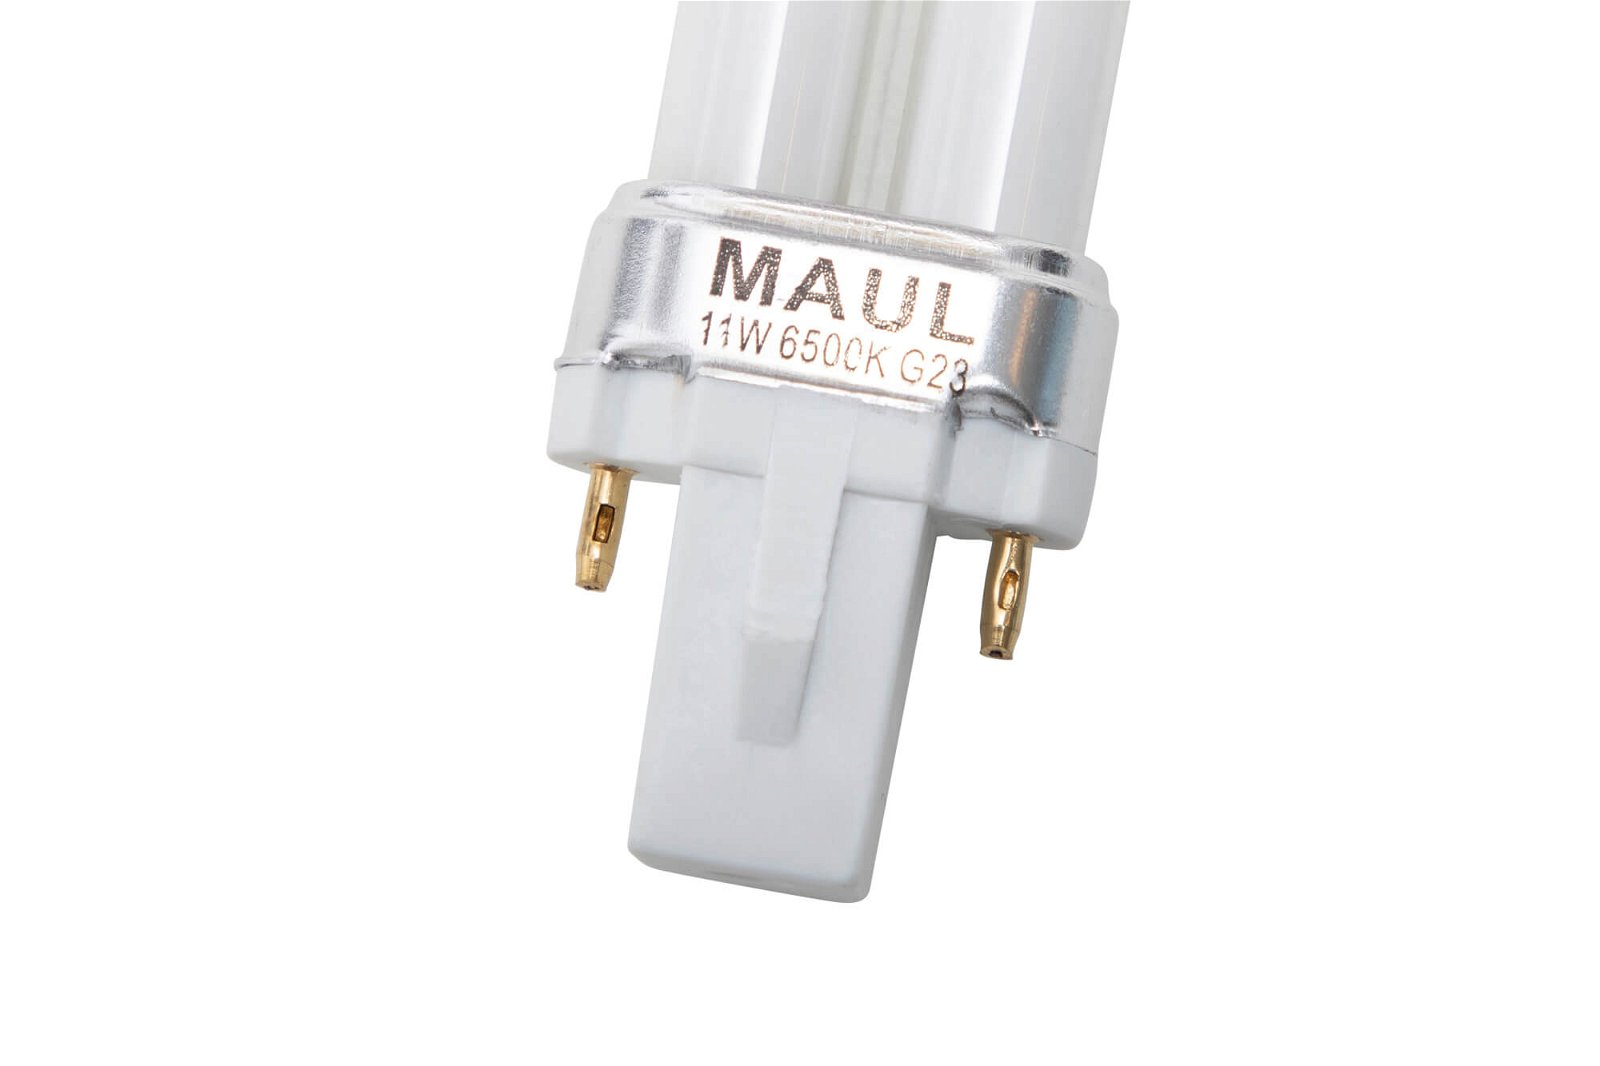 Energiespar-Leuchtmittel, Sockel G23, 6500 K, glasklar